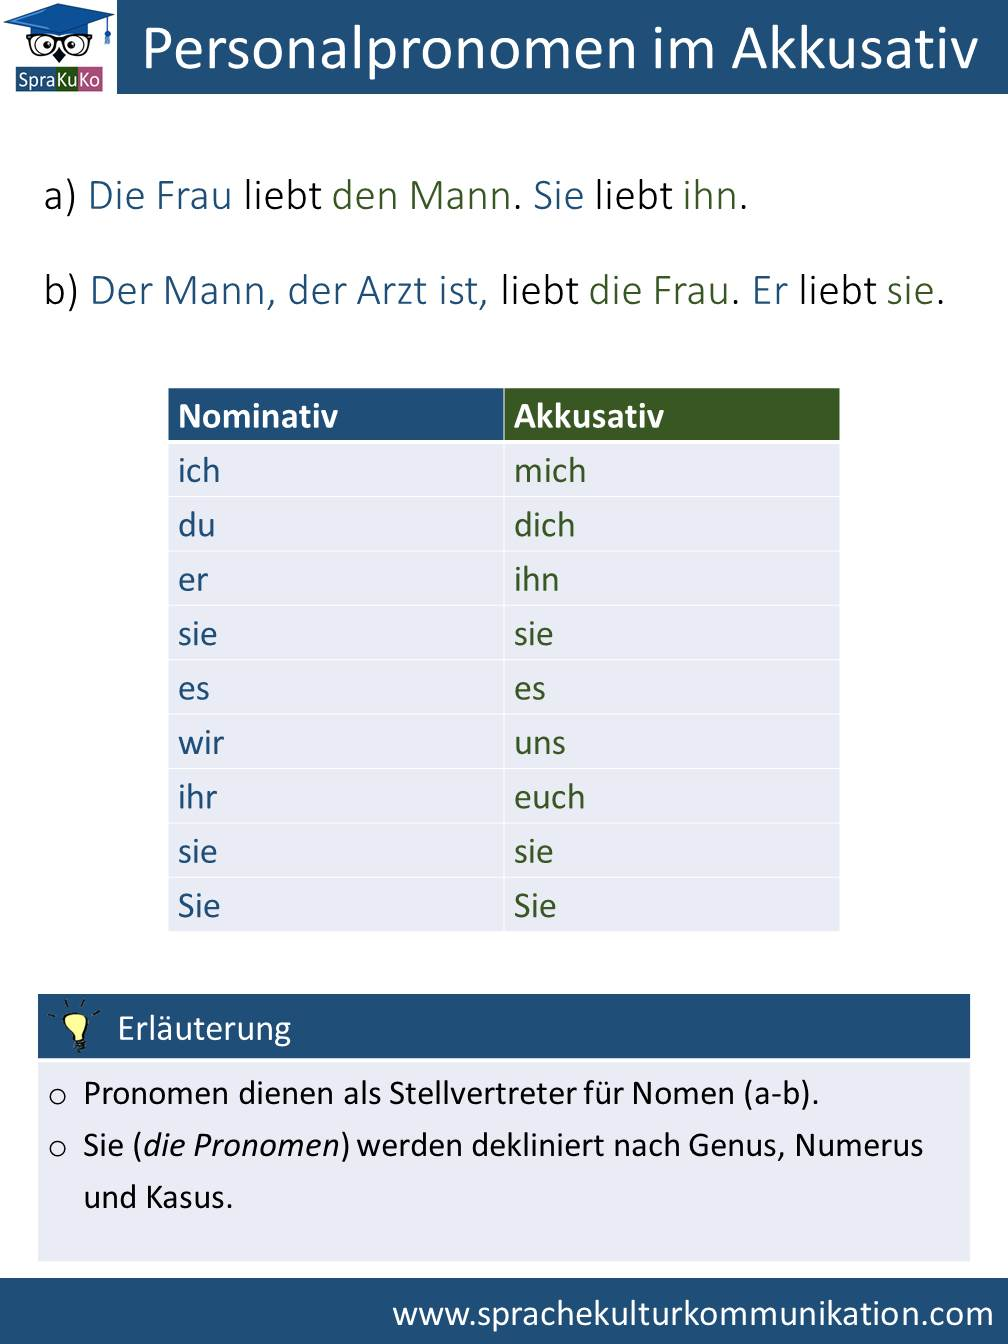 Personalpronomen im Akkusativ.jpg